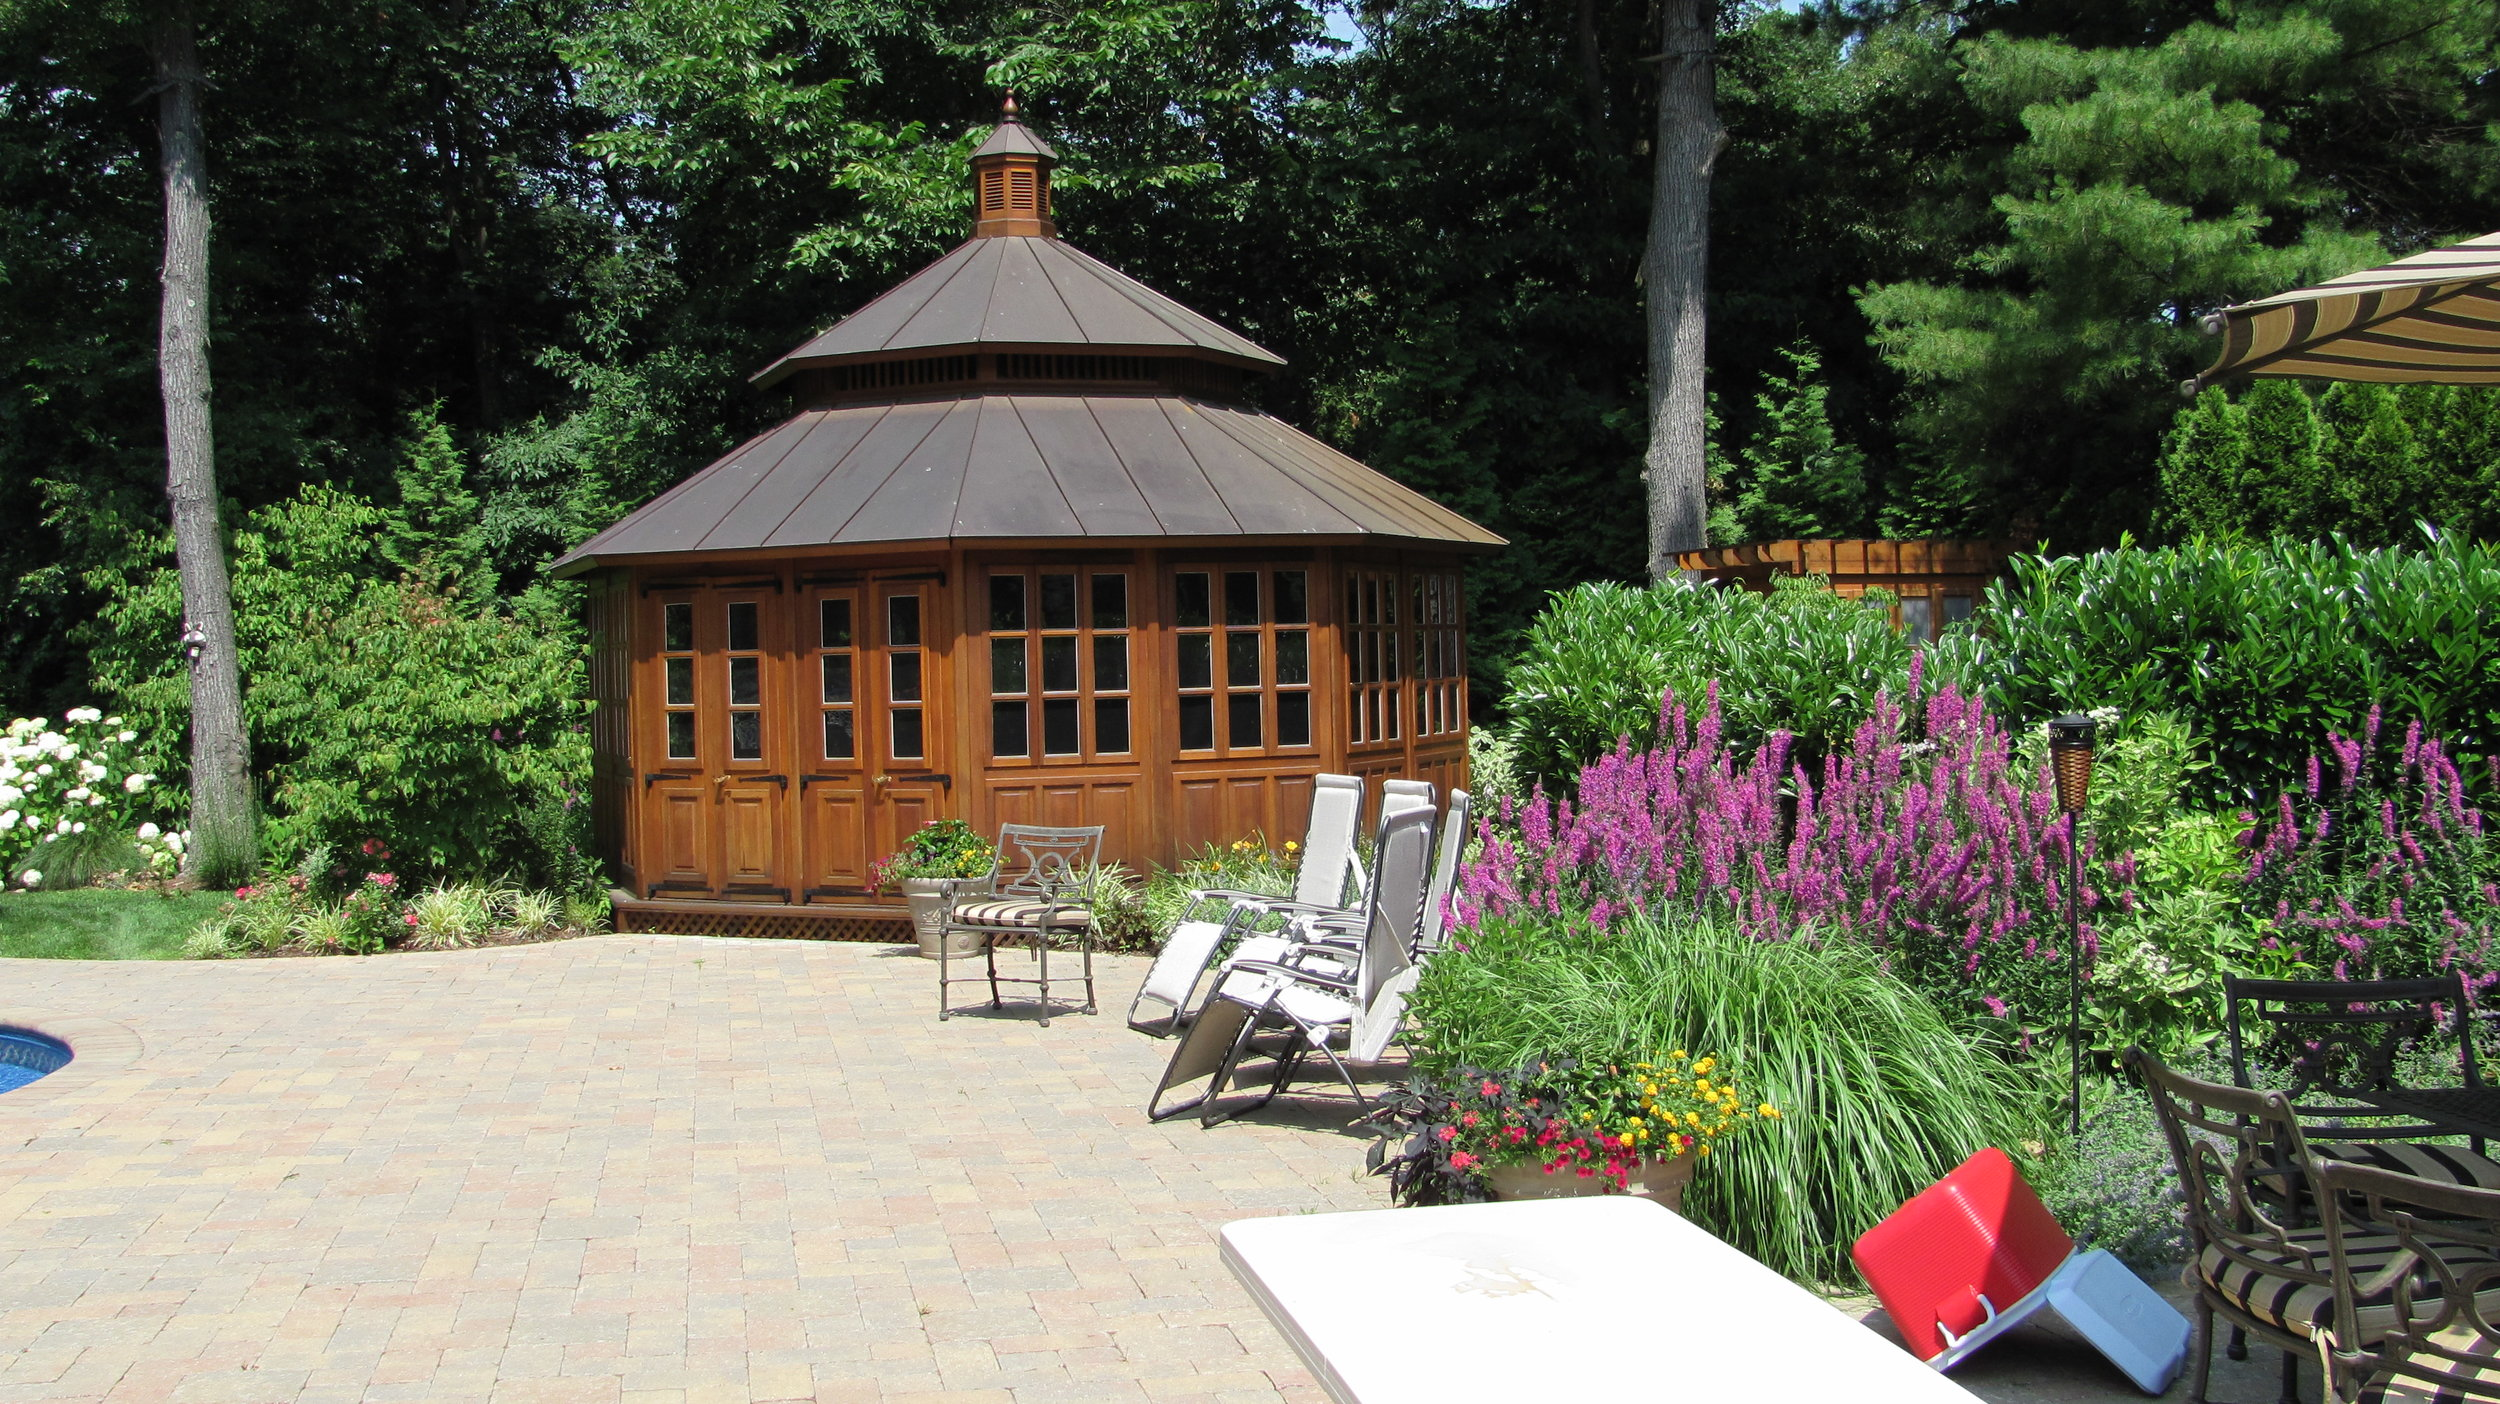 Professional pool cabana design company in Long Island, NY